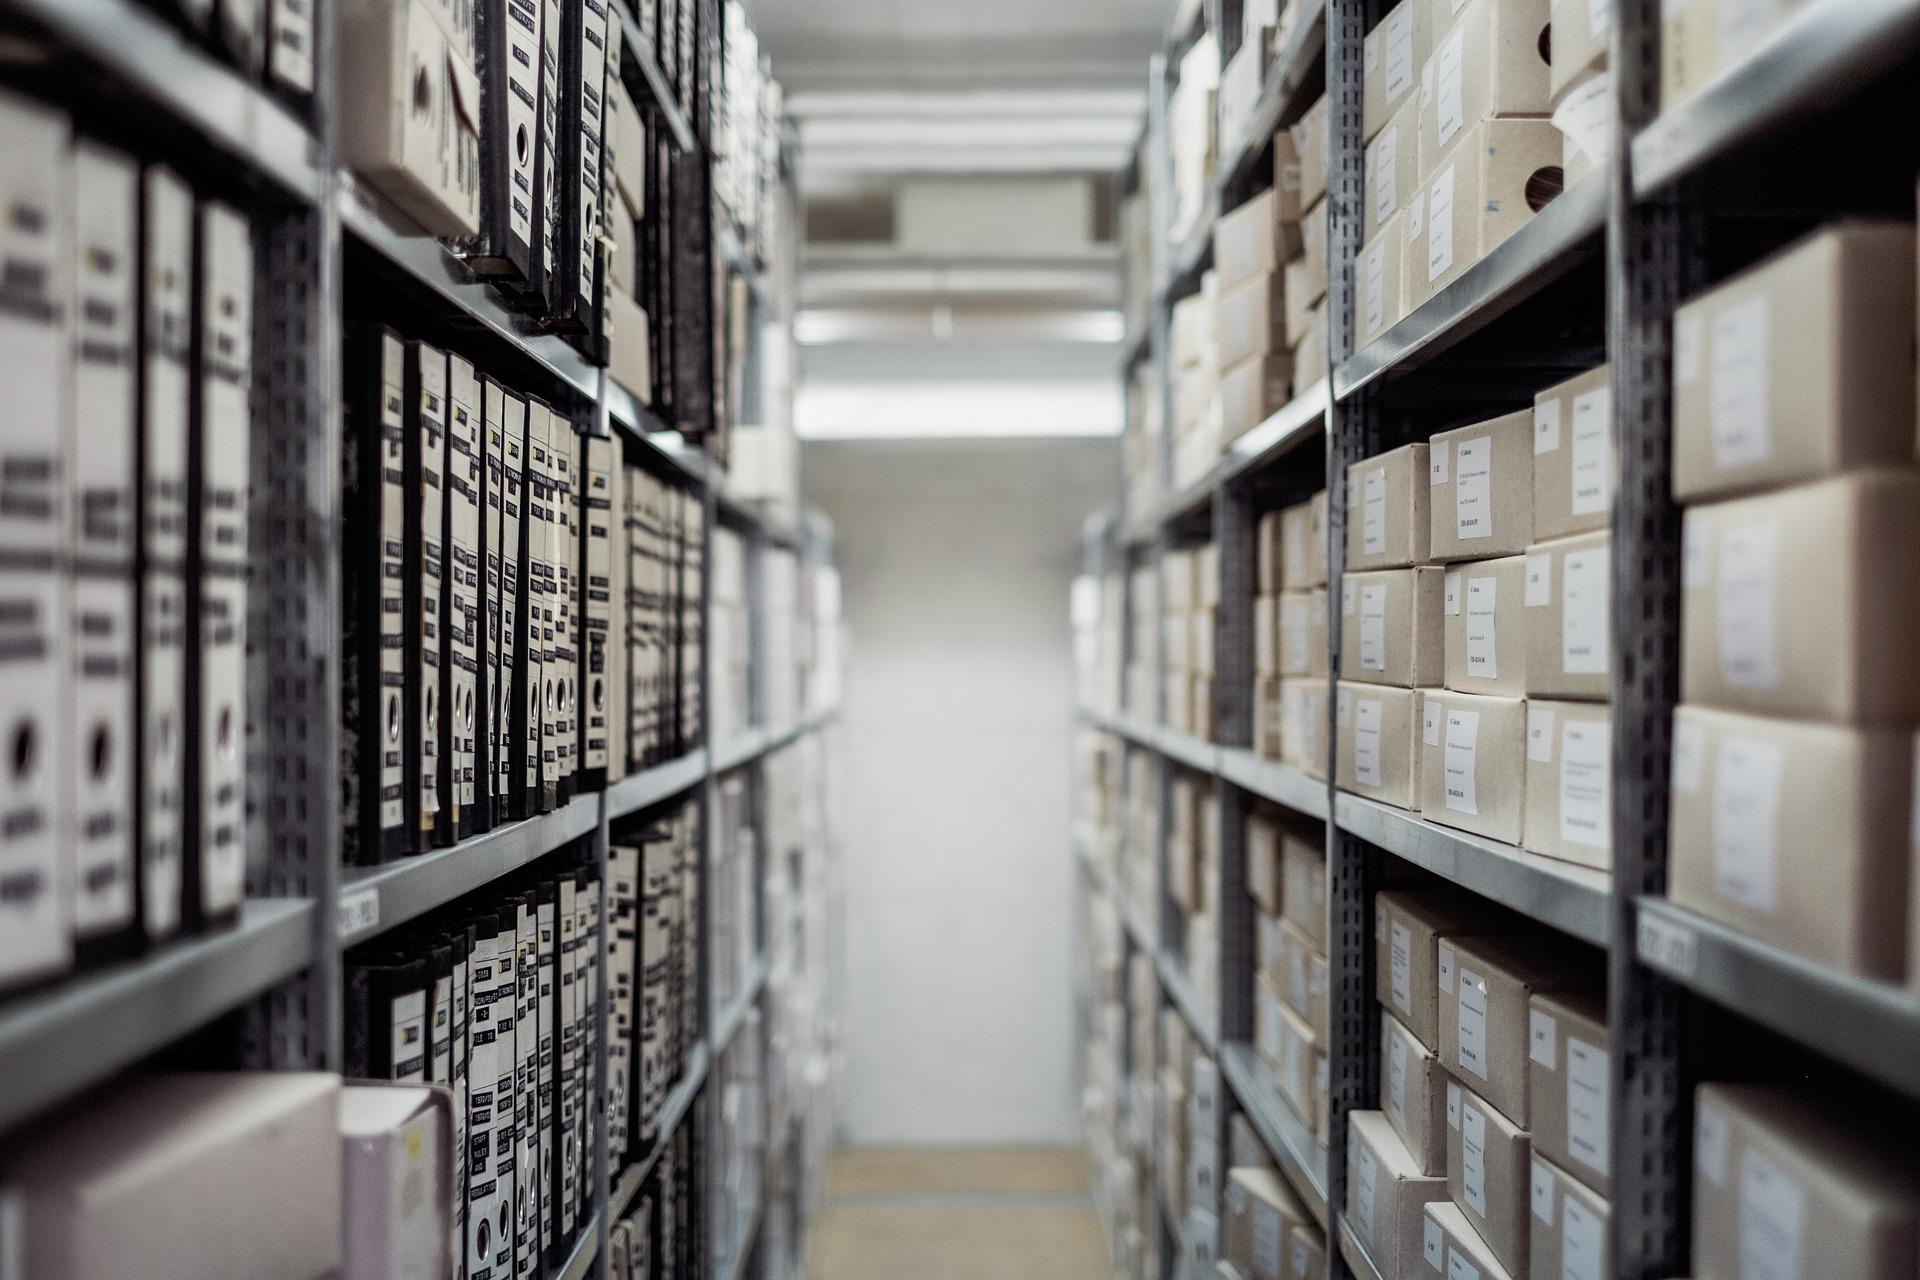 Estanterías de un archivo histórico